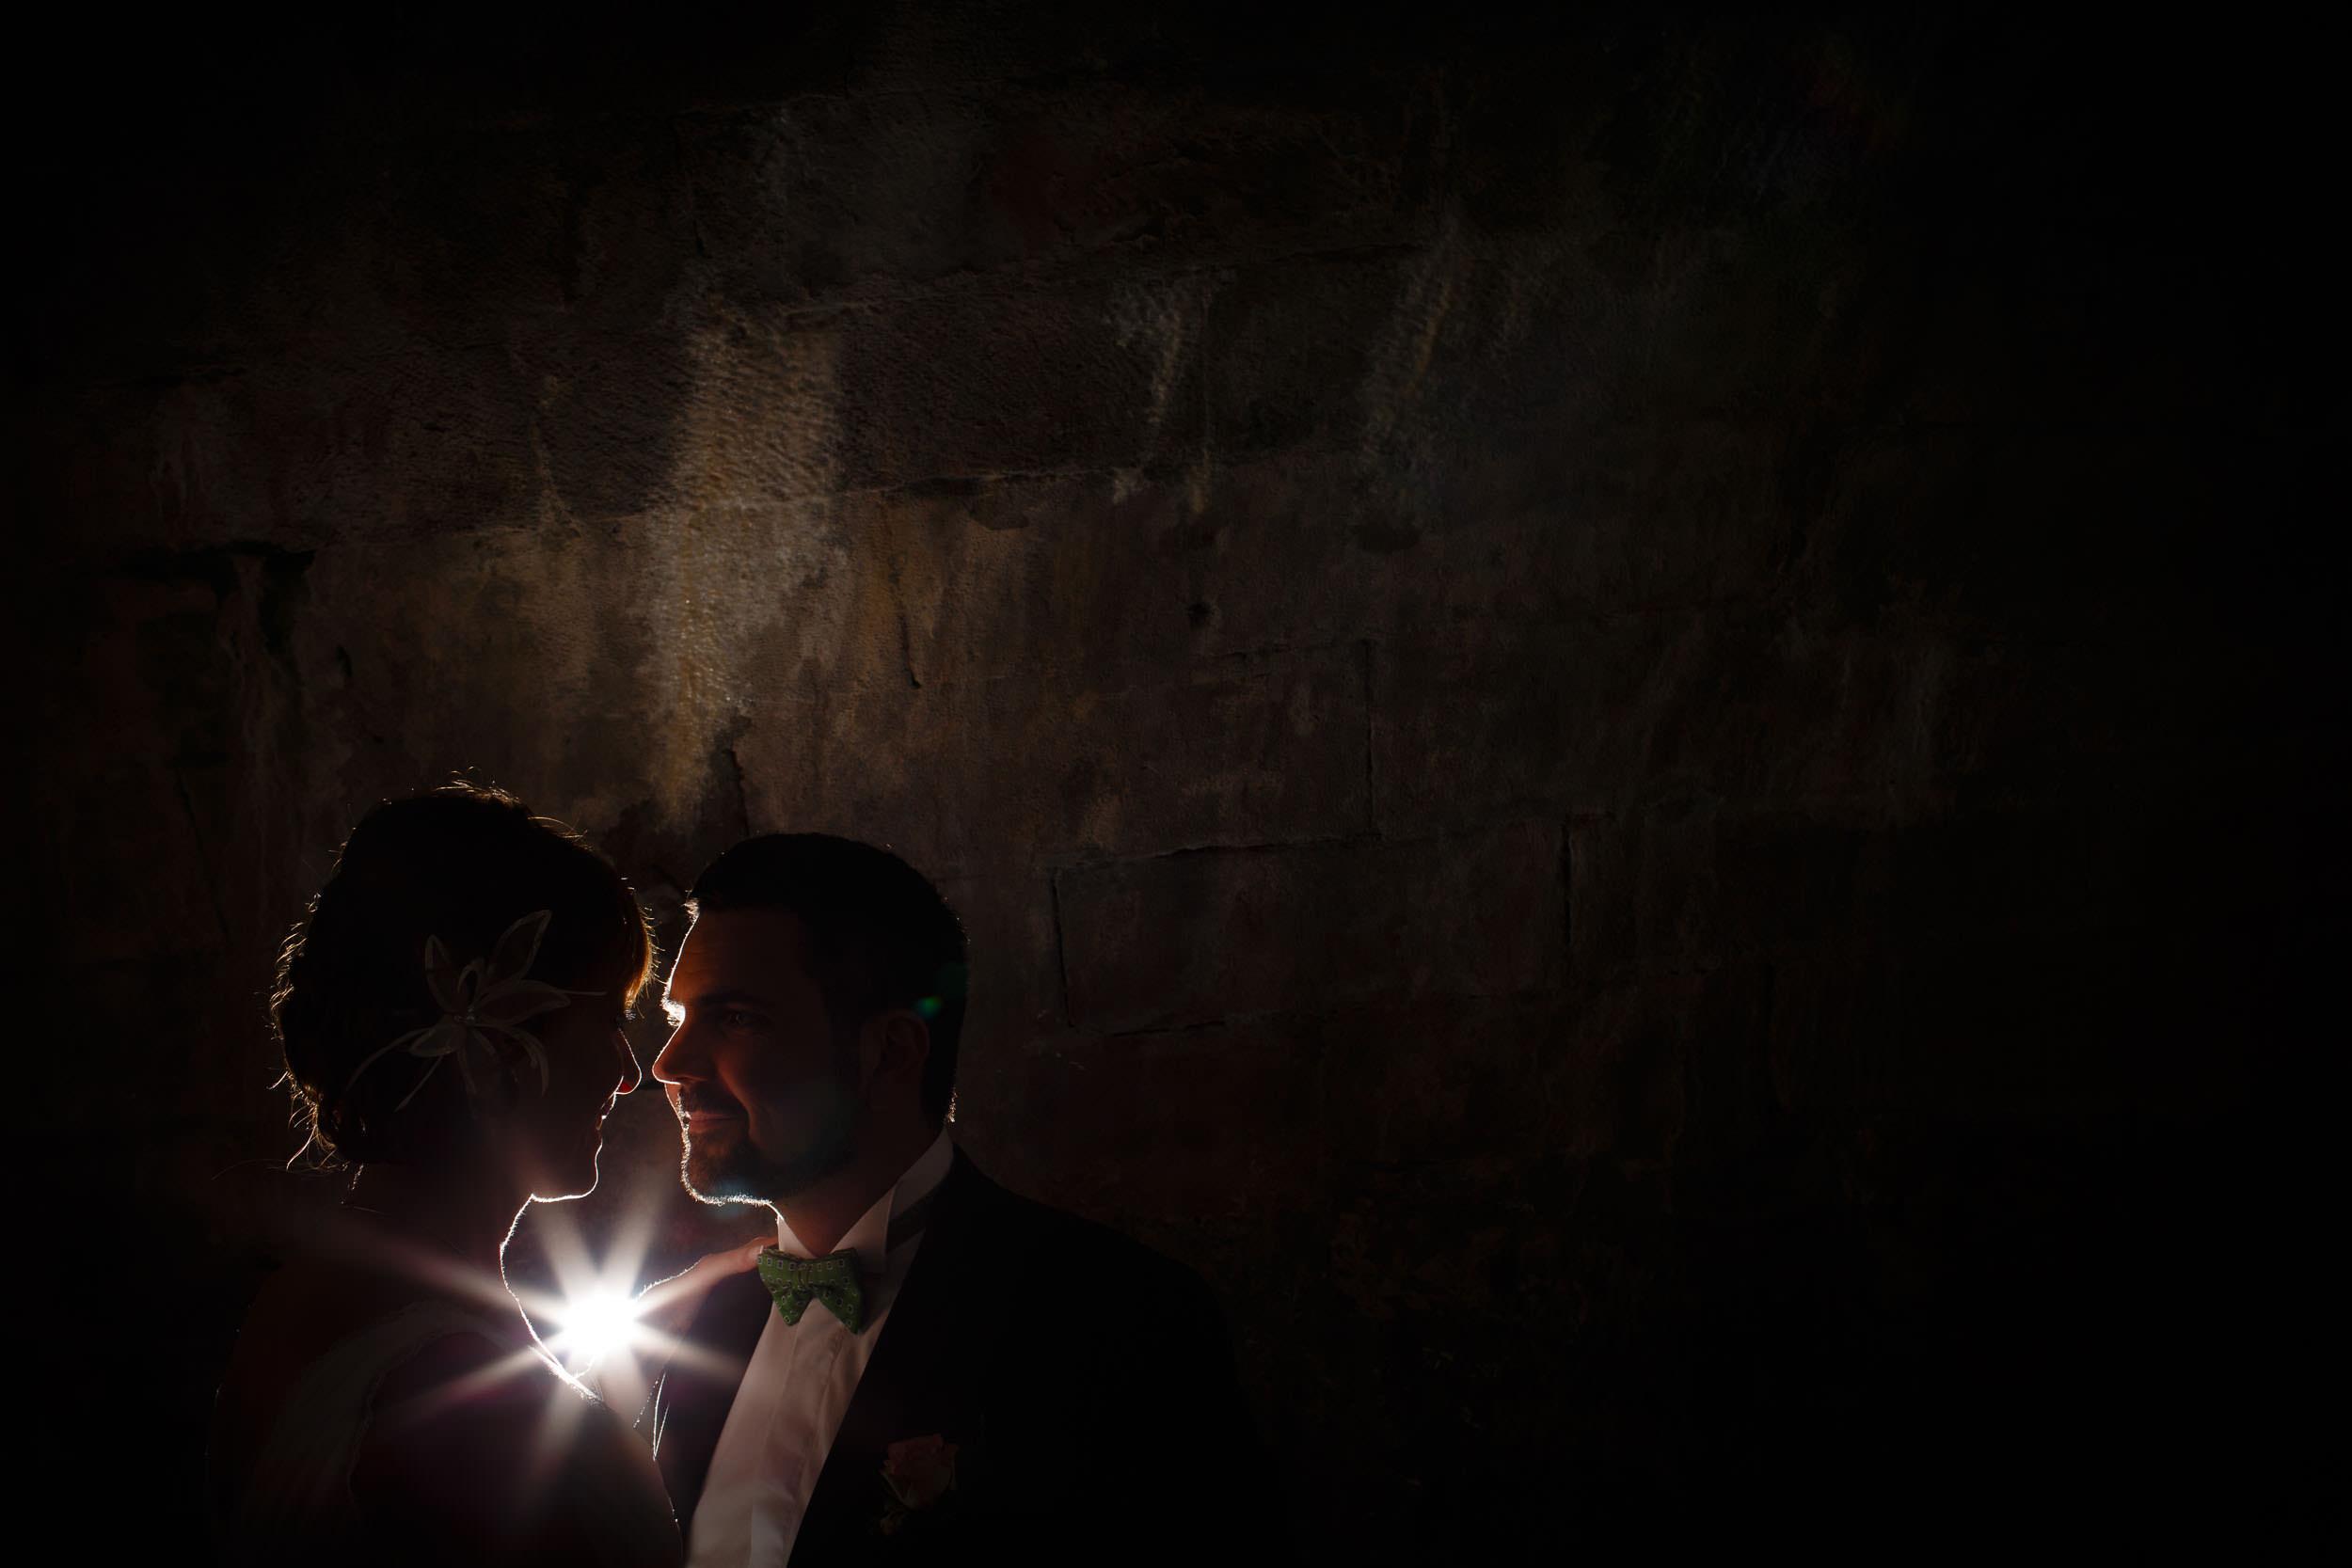 Engagement photography in Portugalete, Basque Country, Spain - James Sturcke  Photographer | sturcke.org_006.jpg